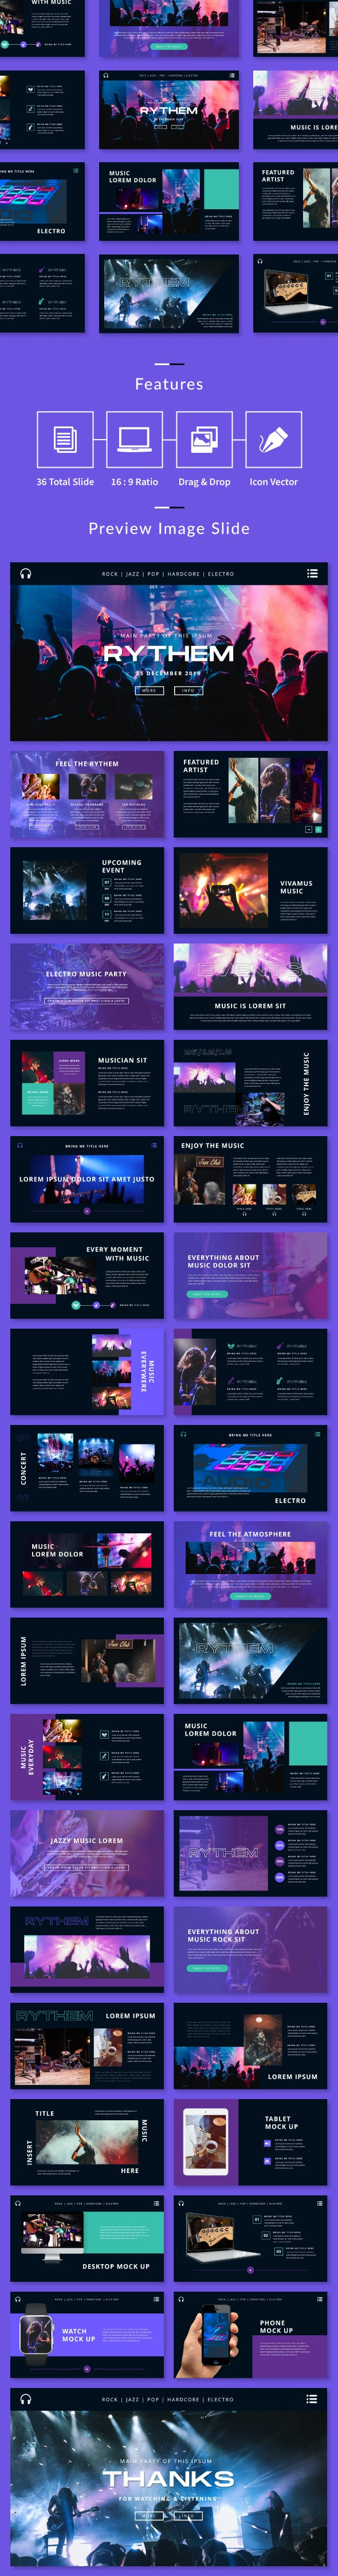 Rythem Music Event - PowerPoint Template - Creative PowerPoint Templates